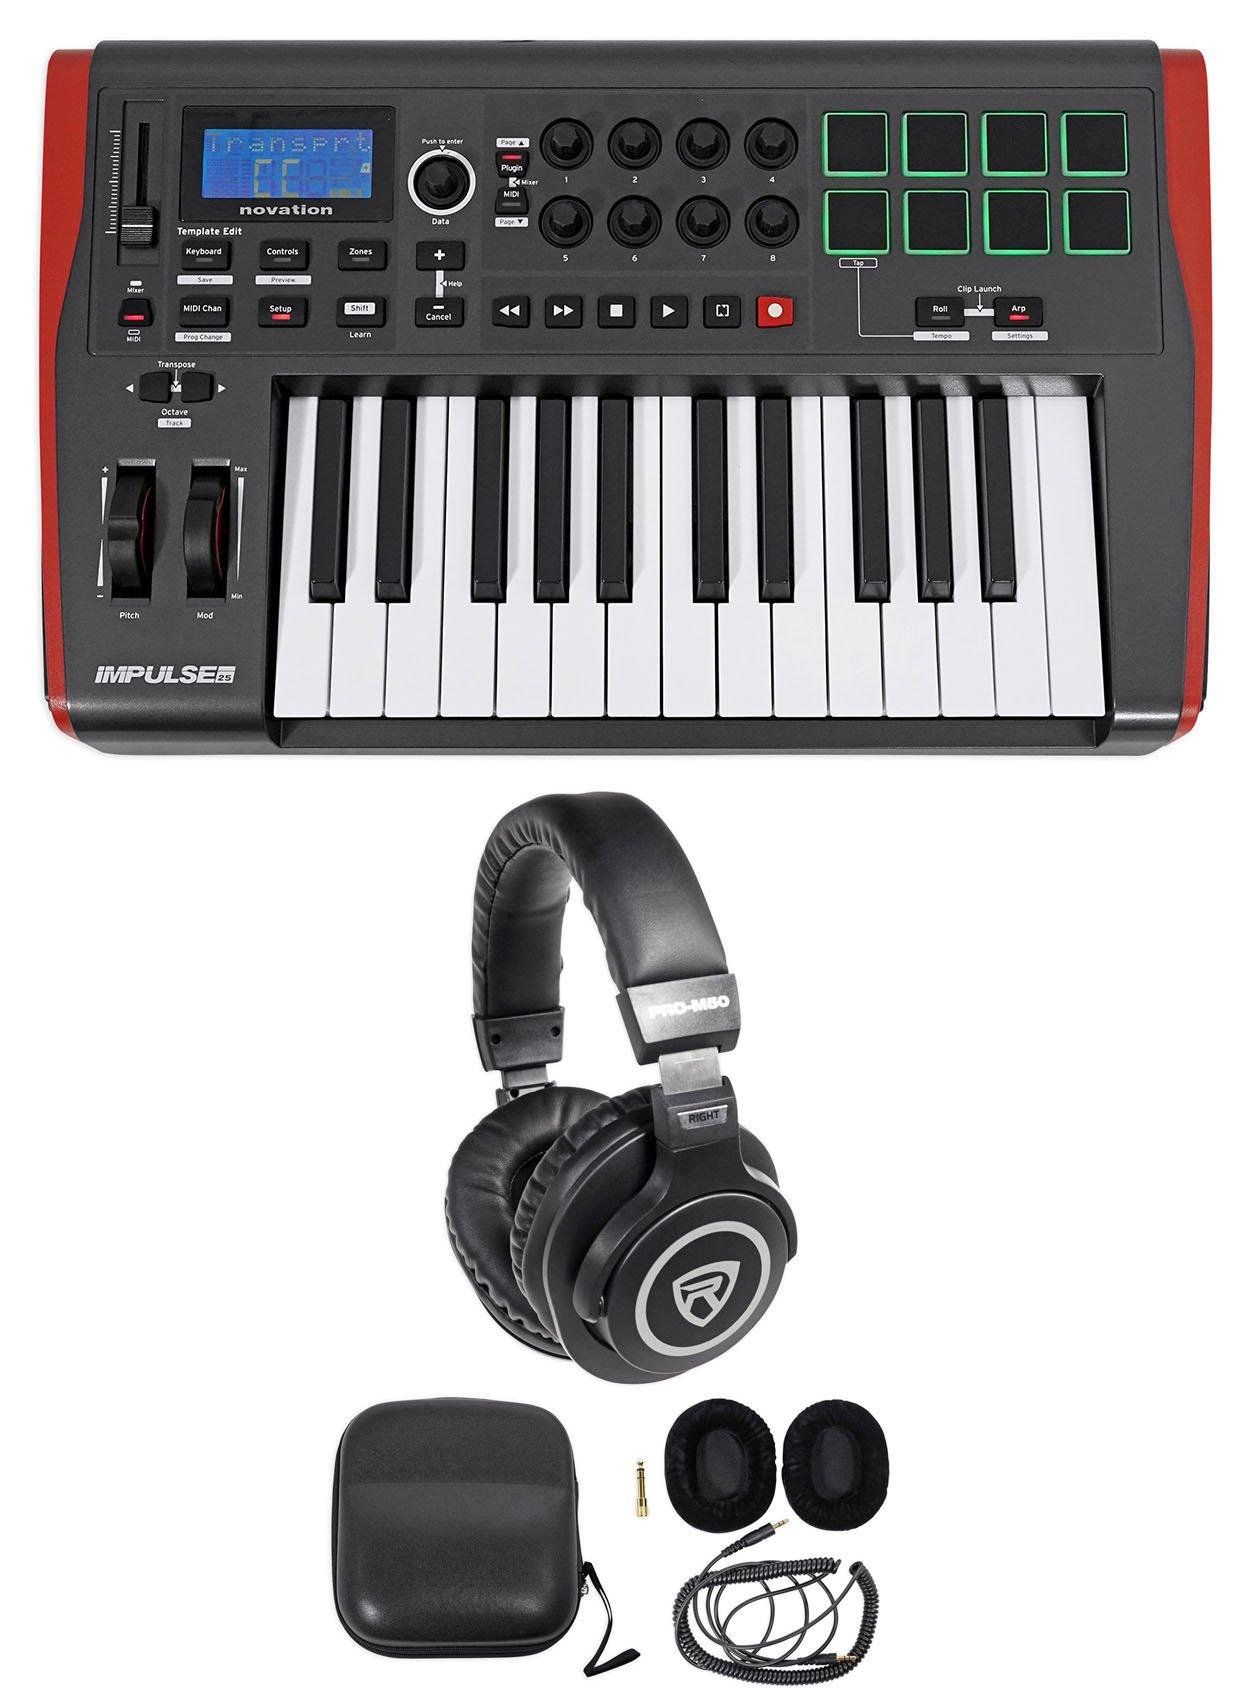 Novation IMPULSE 25 Ableton Live 25-Key MIDI USB Keyboard Controller+Headphones